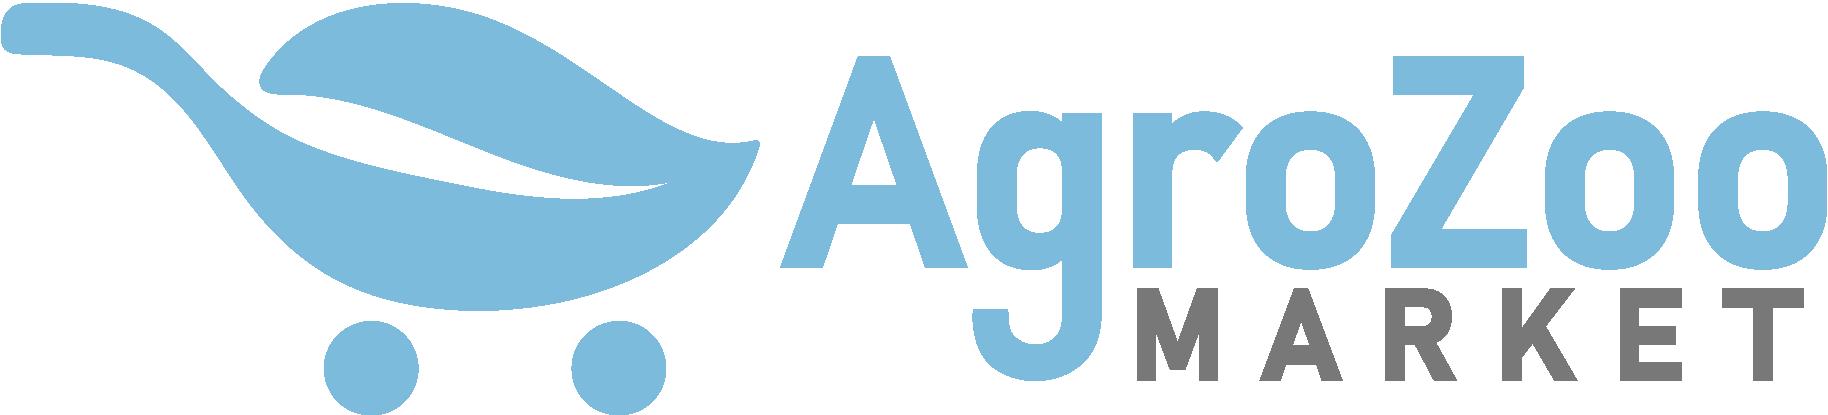 AgroZooMarket